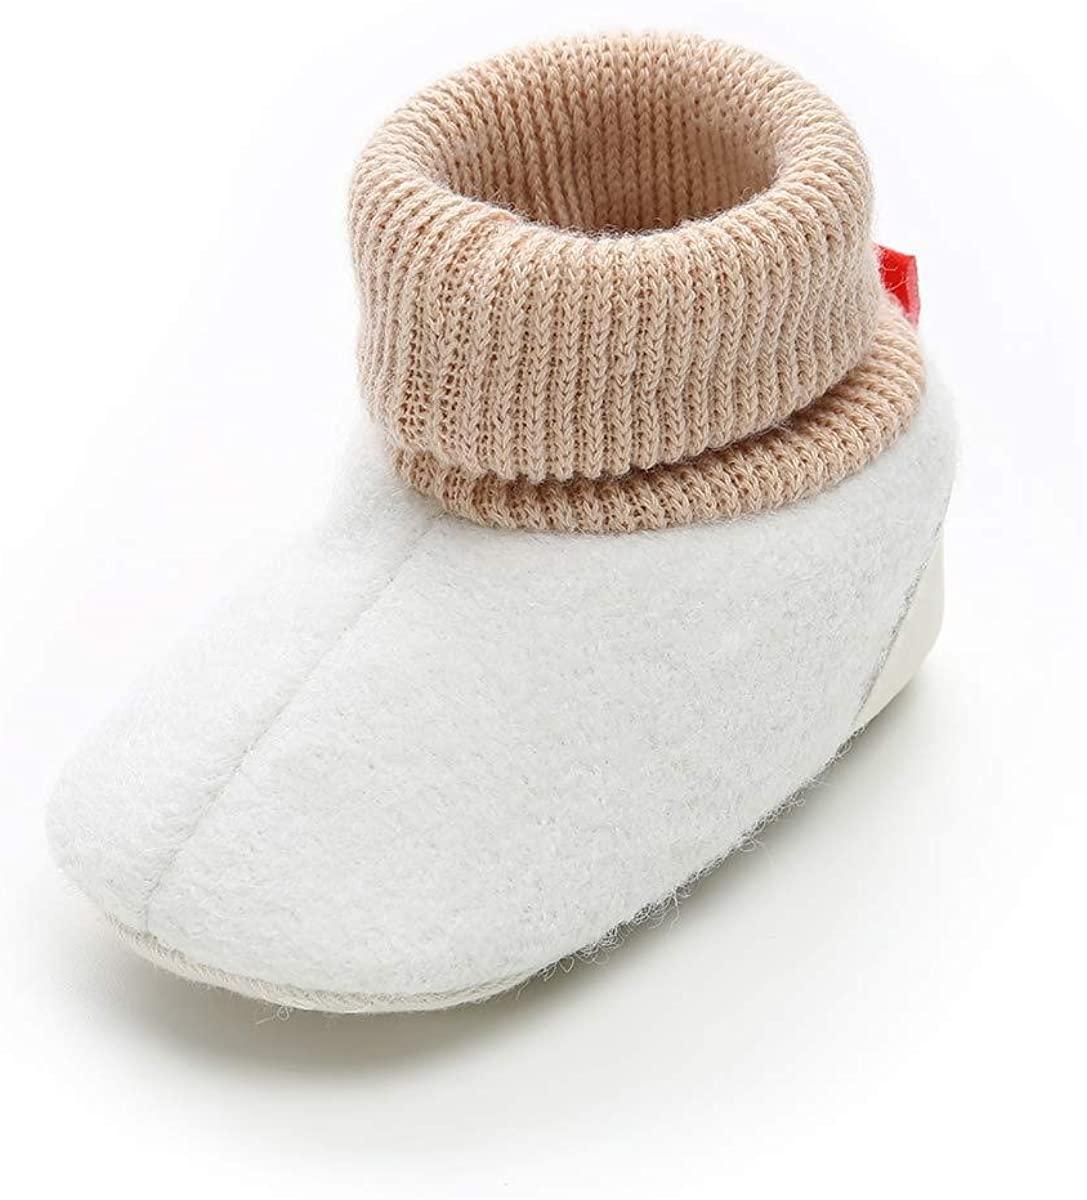 Aincanlx Baby Boys Girls Cozy Fleece Booties Non-Slip Bottom Warm Winter Slippers Socks Infant Crib Shoes First Birthday Gift